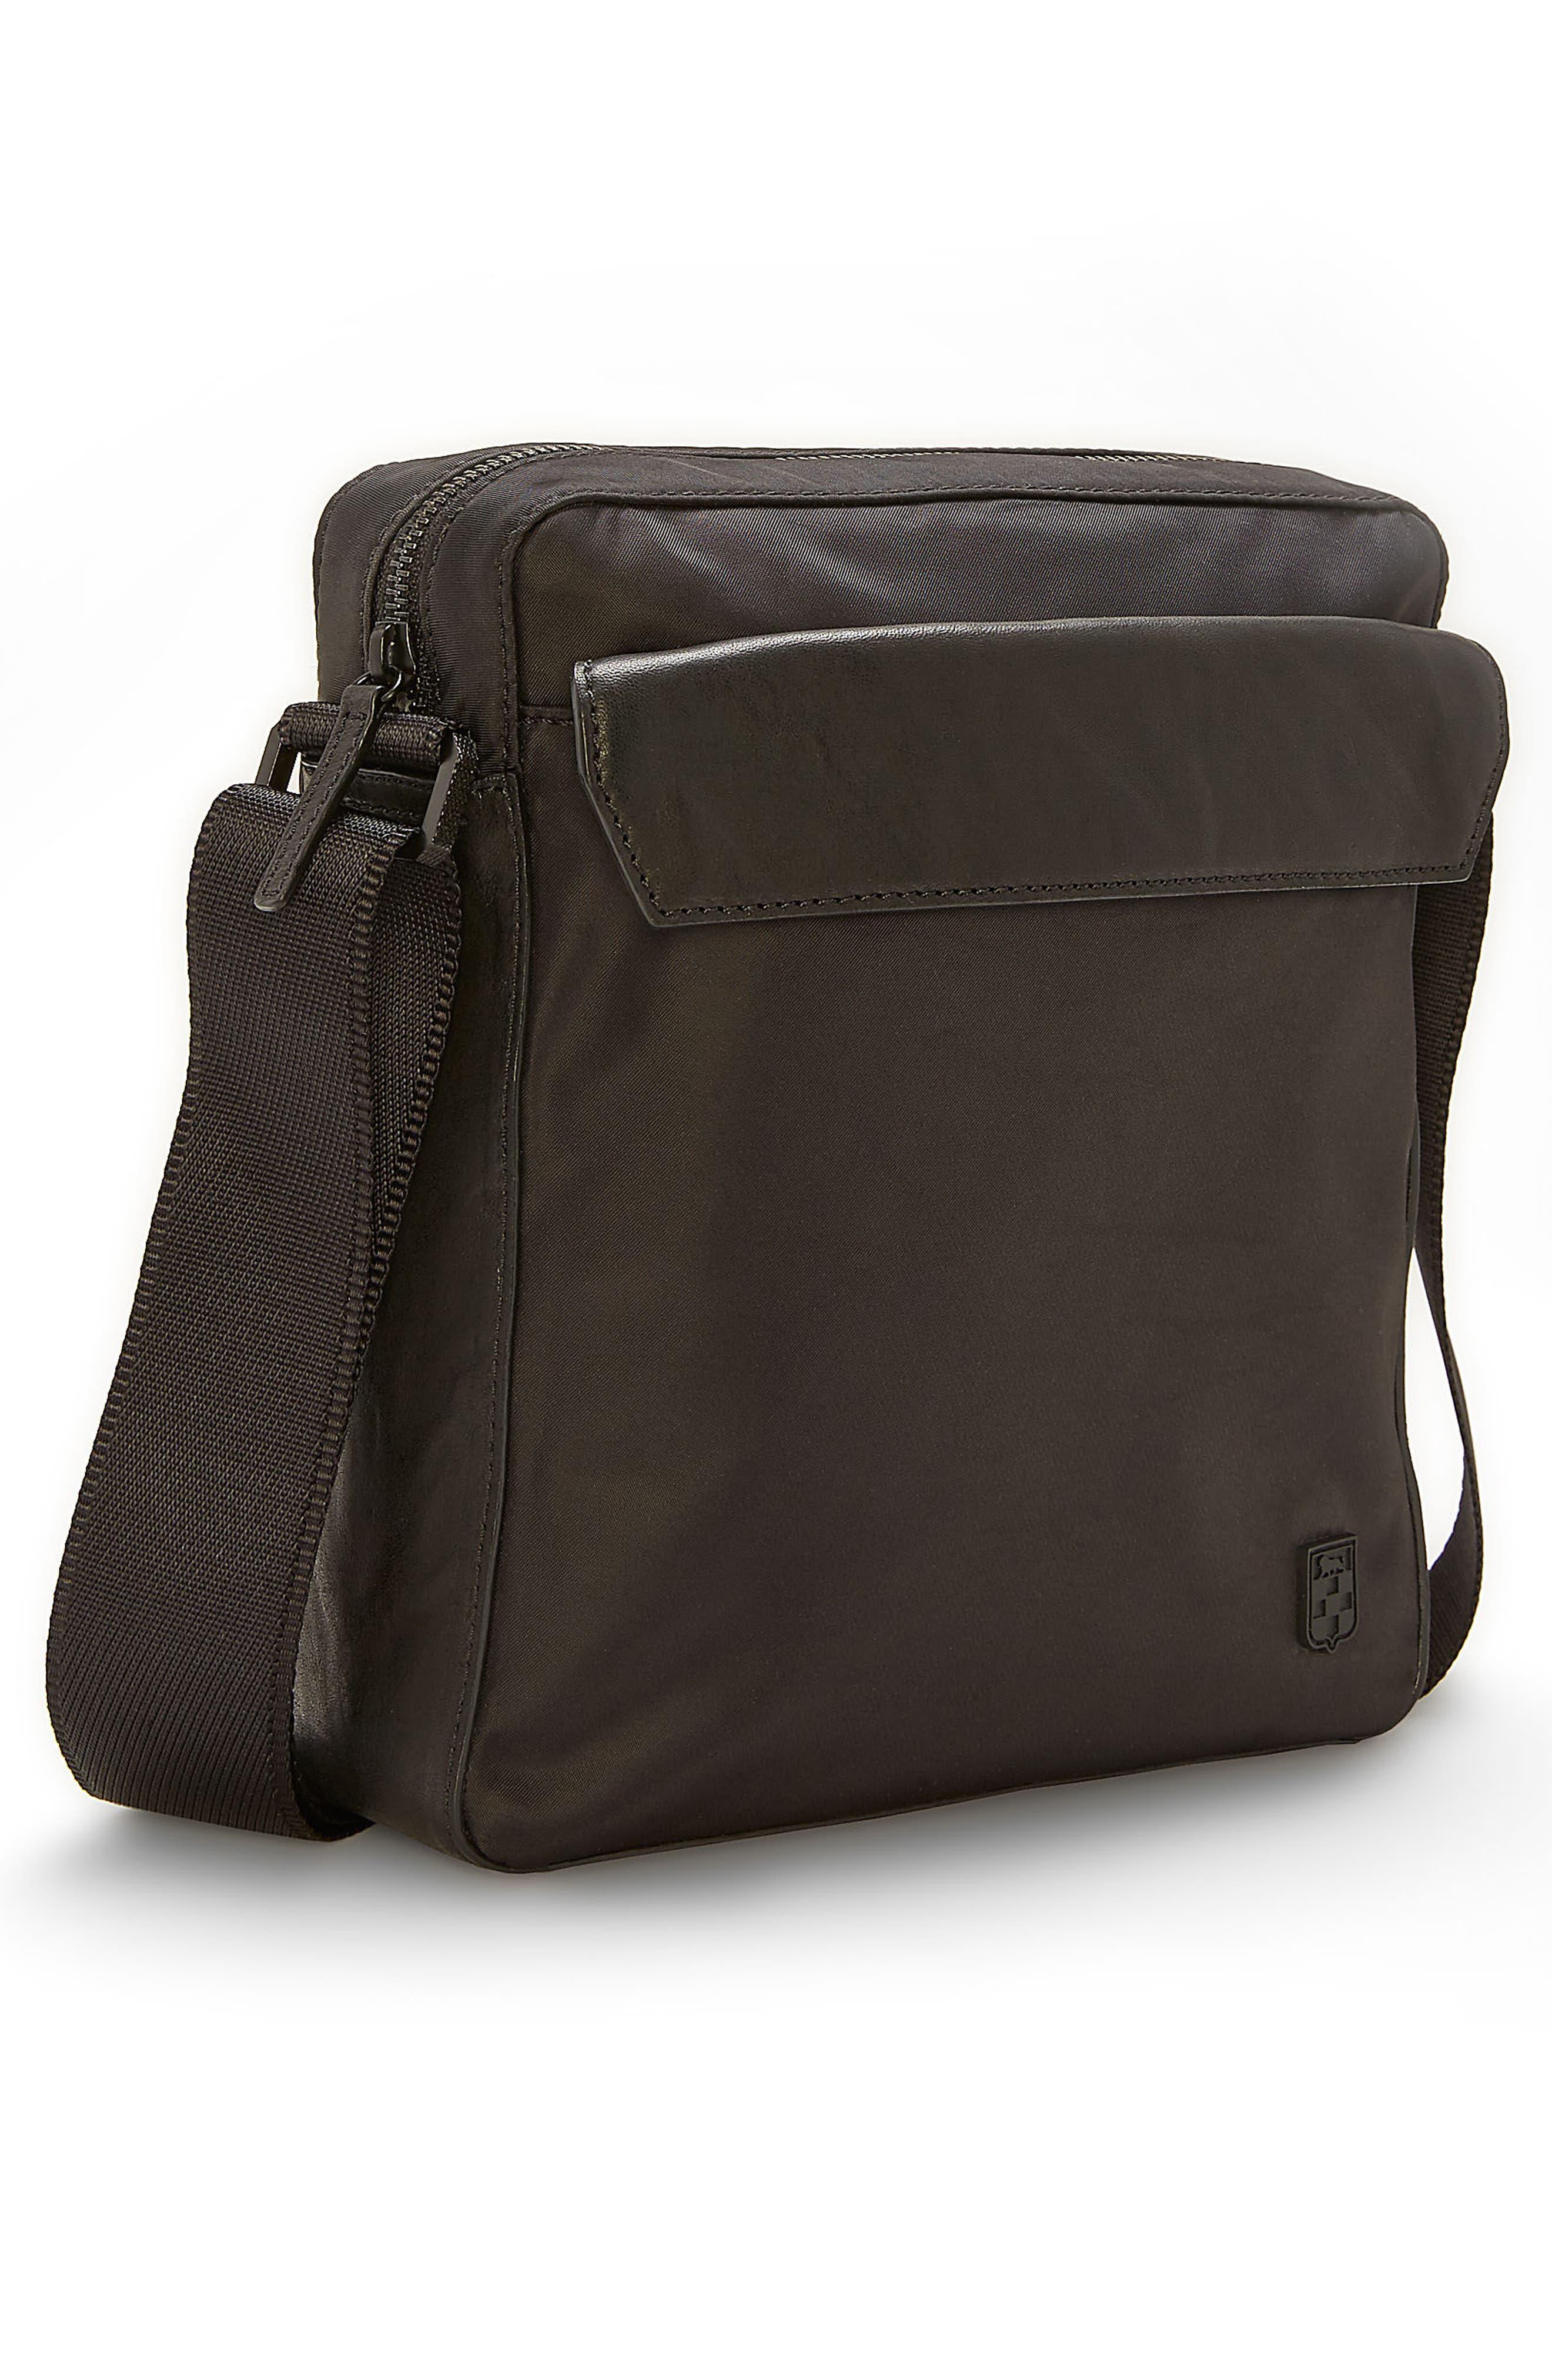 Basin Crossbody Bag,                             Alternate thumbnail 2, color,                             Black